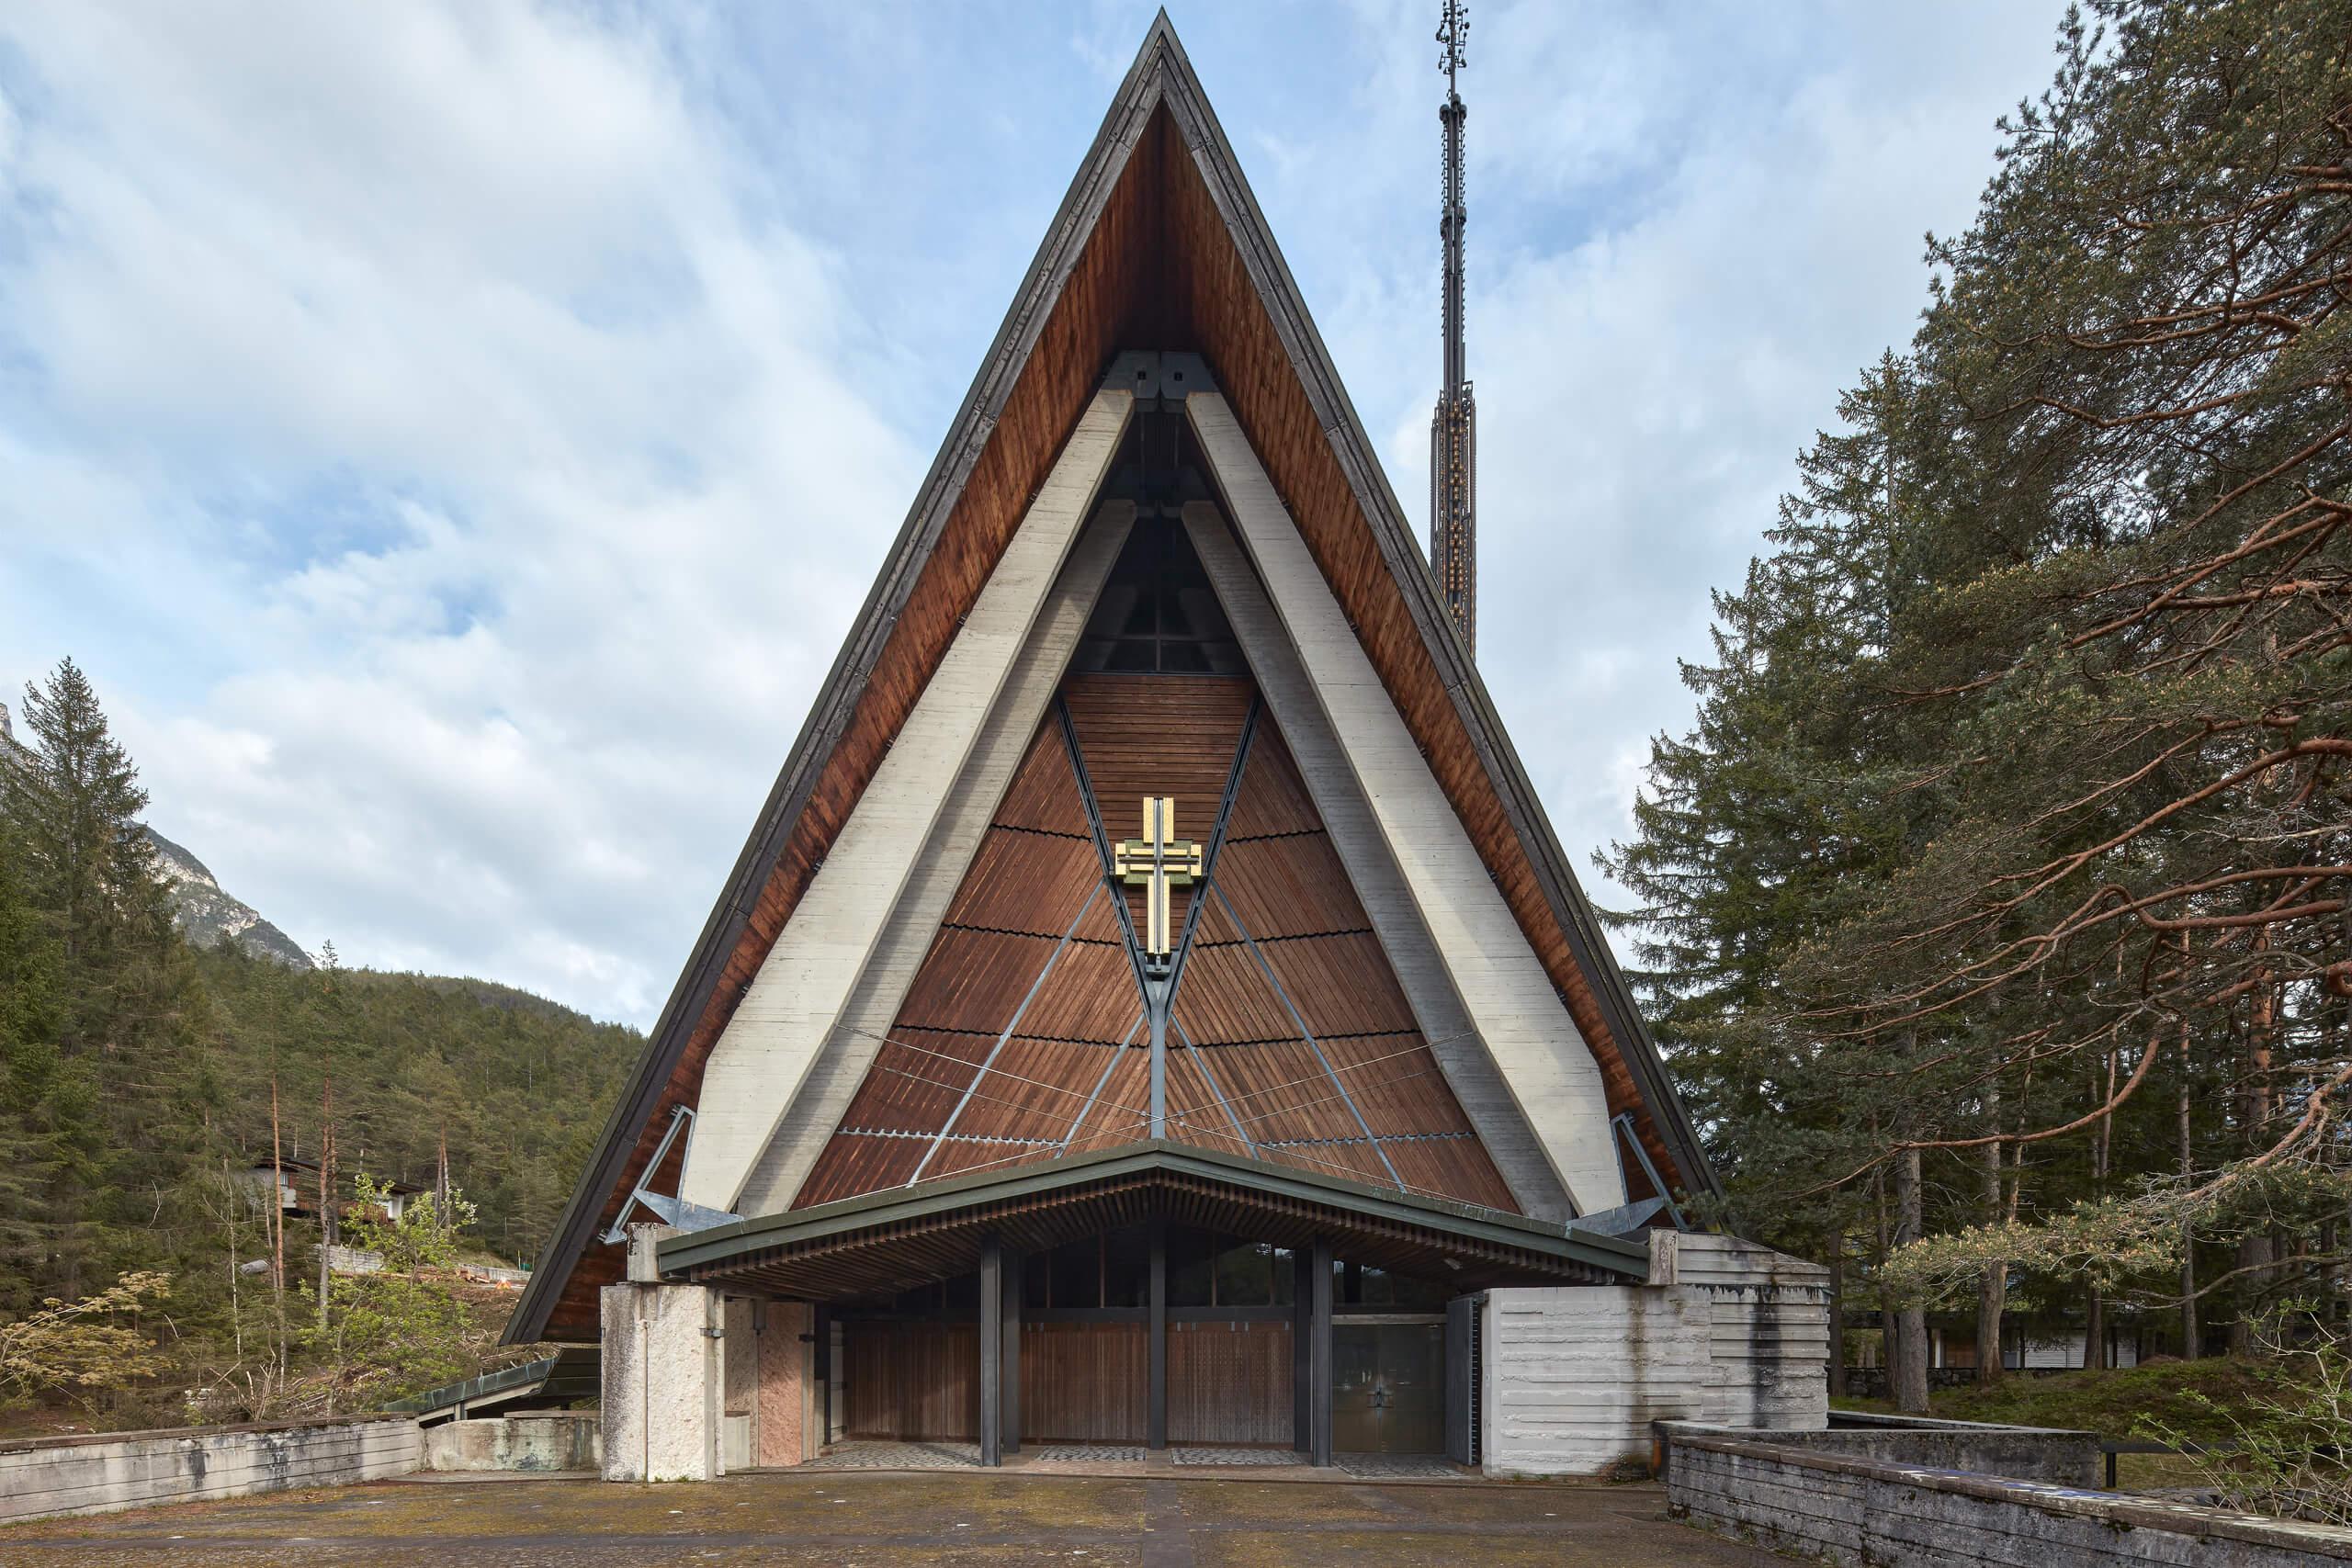 Chiesa Nostra Signore del Cadore – Arch. Edoardo Gellner – A